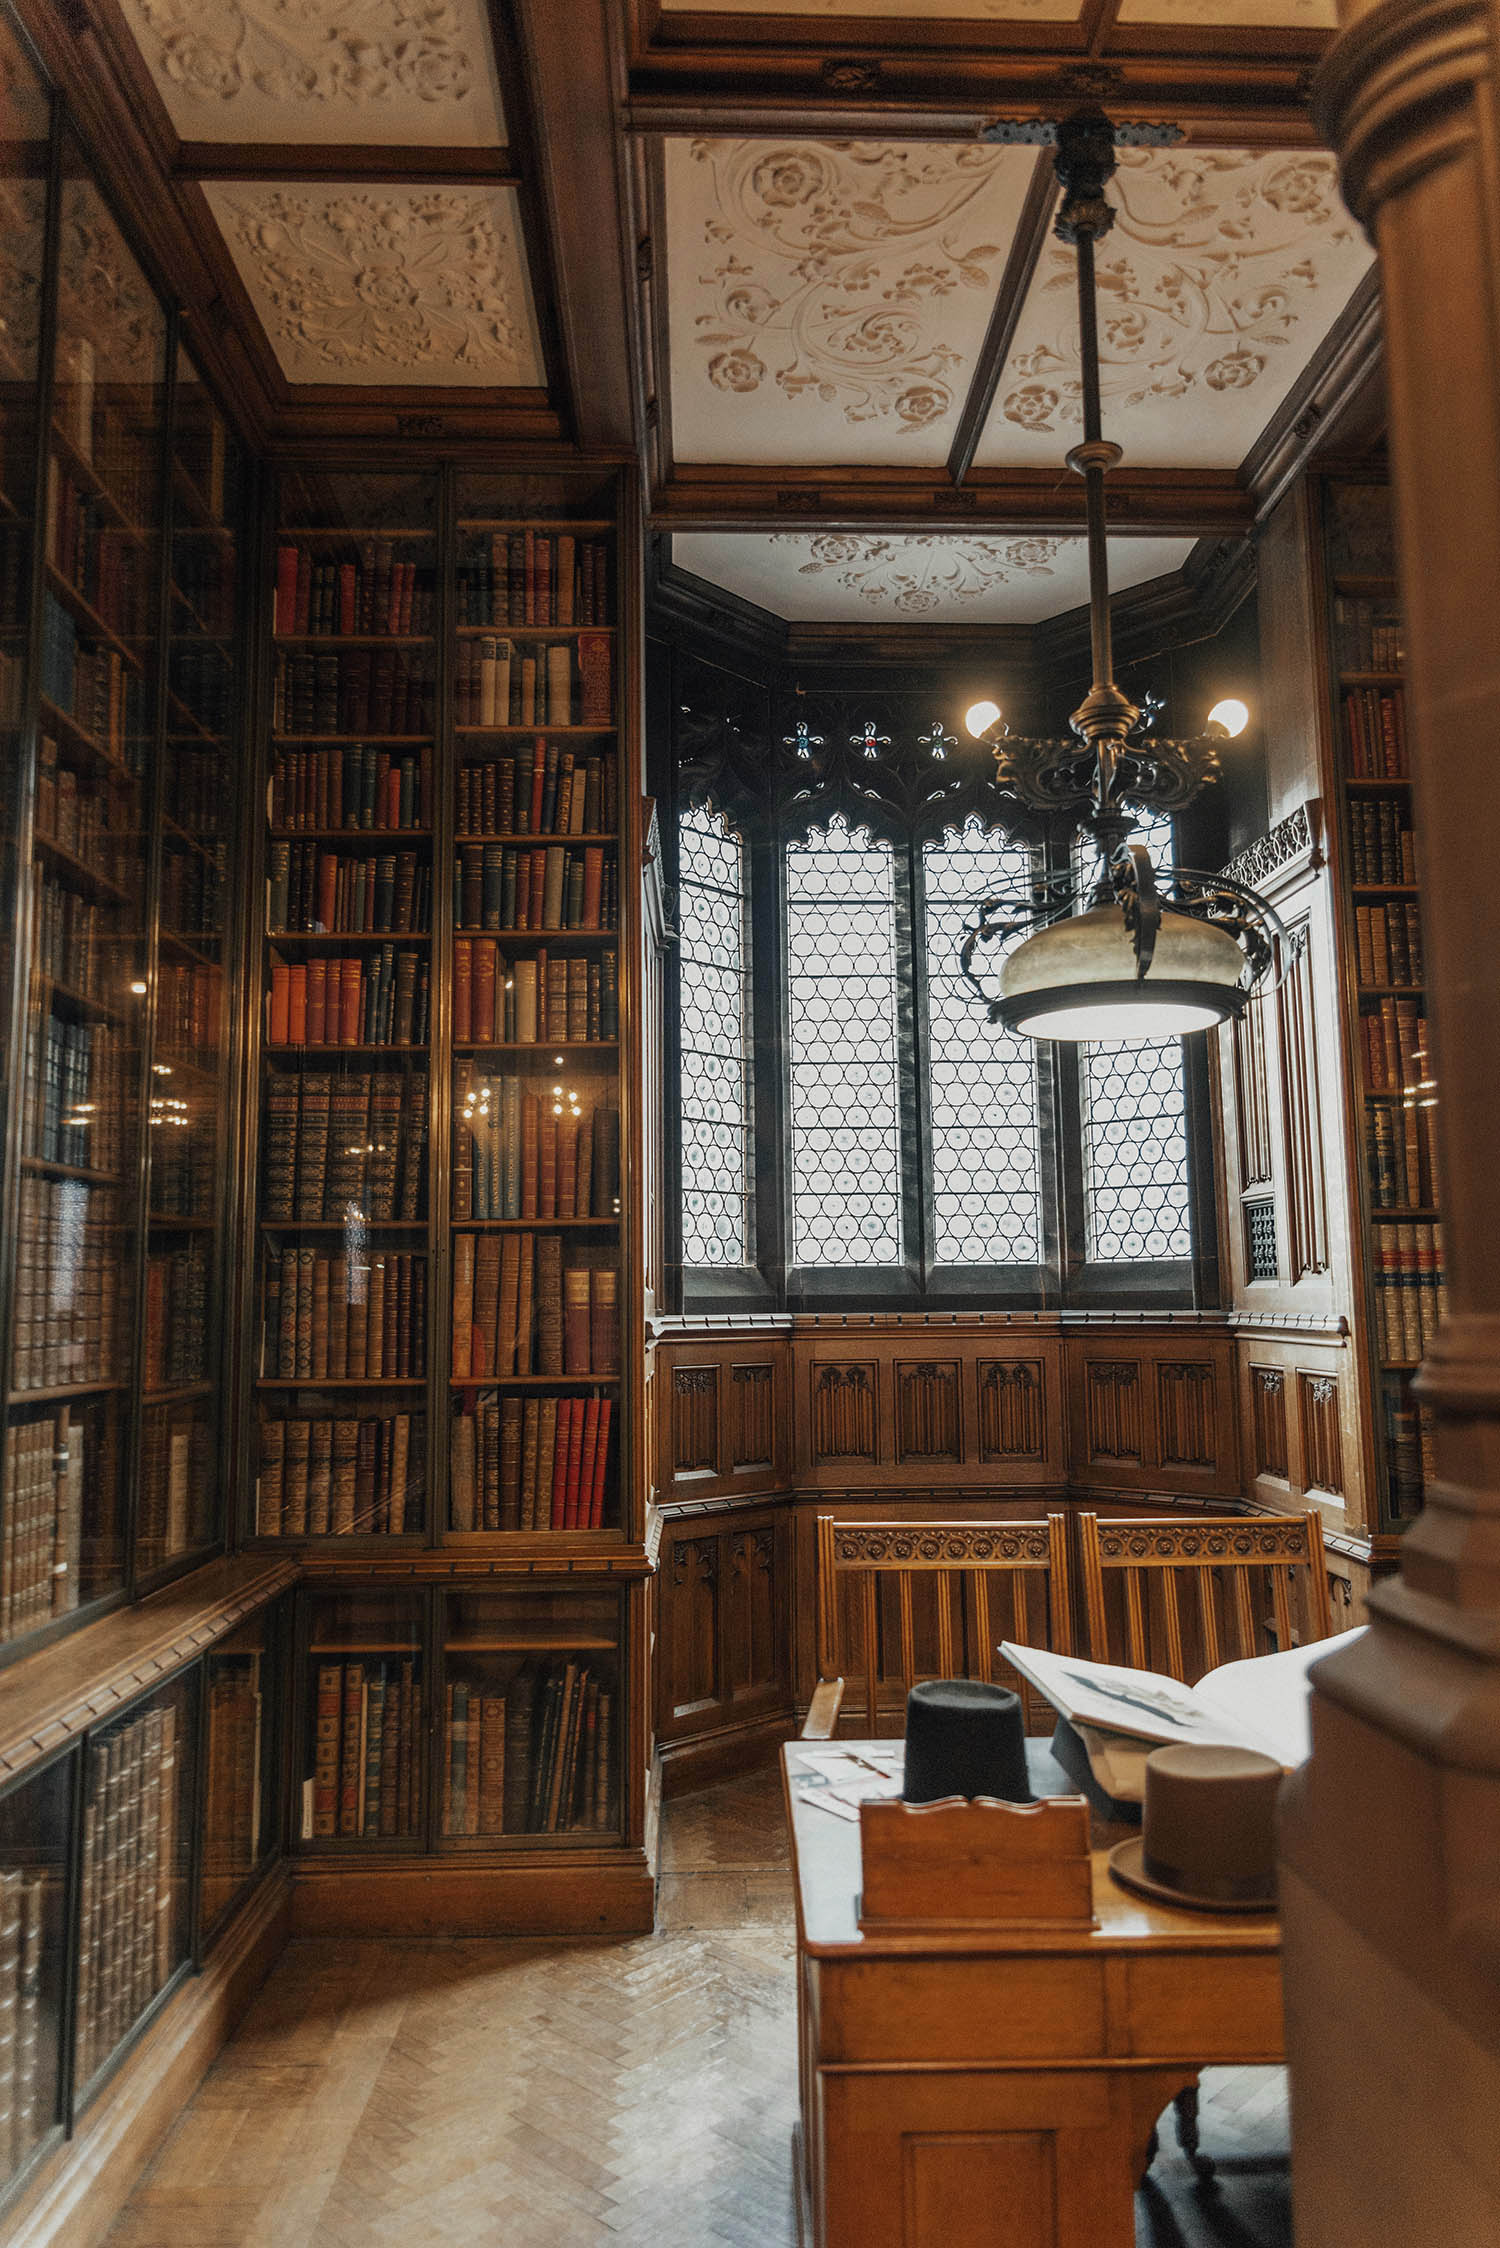 John Rylands Library, Manchester - Books